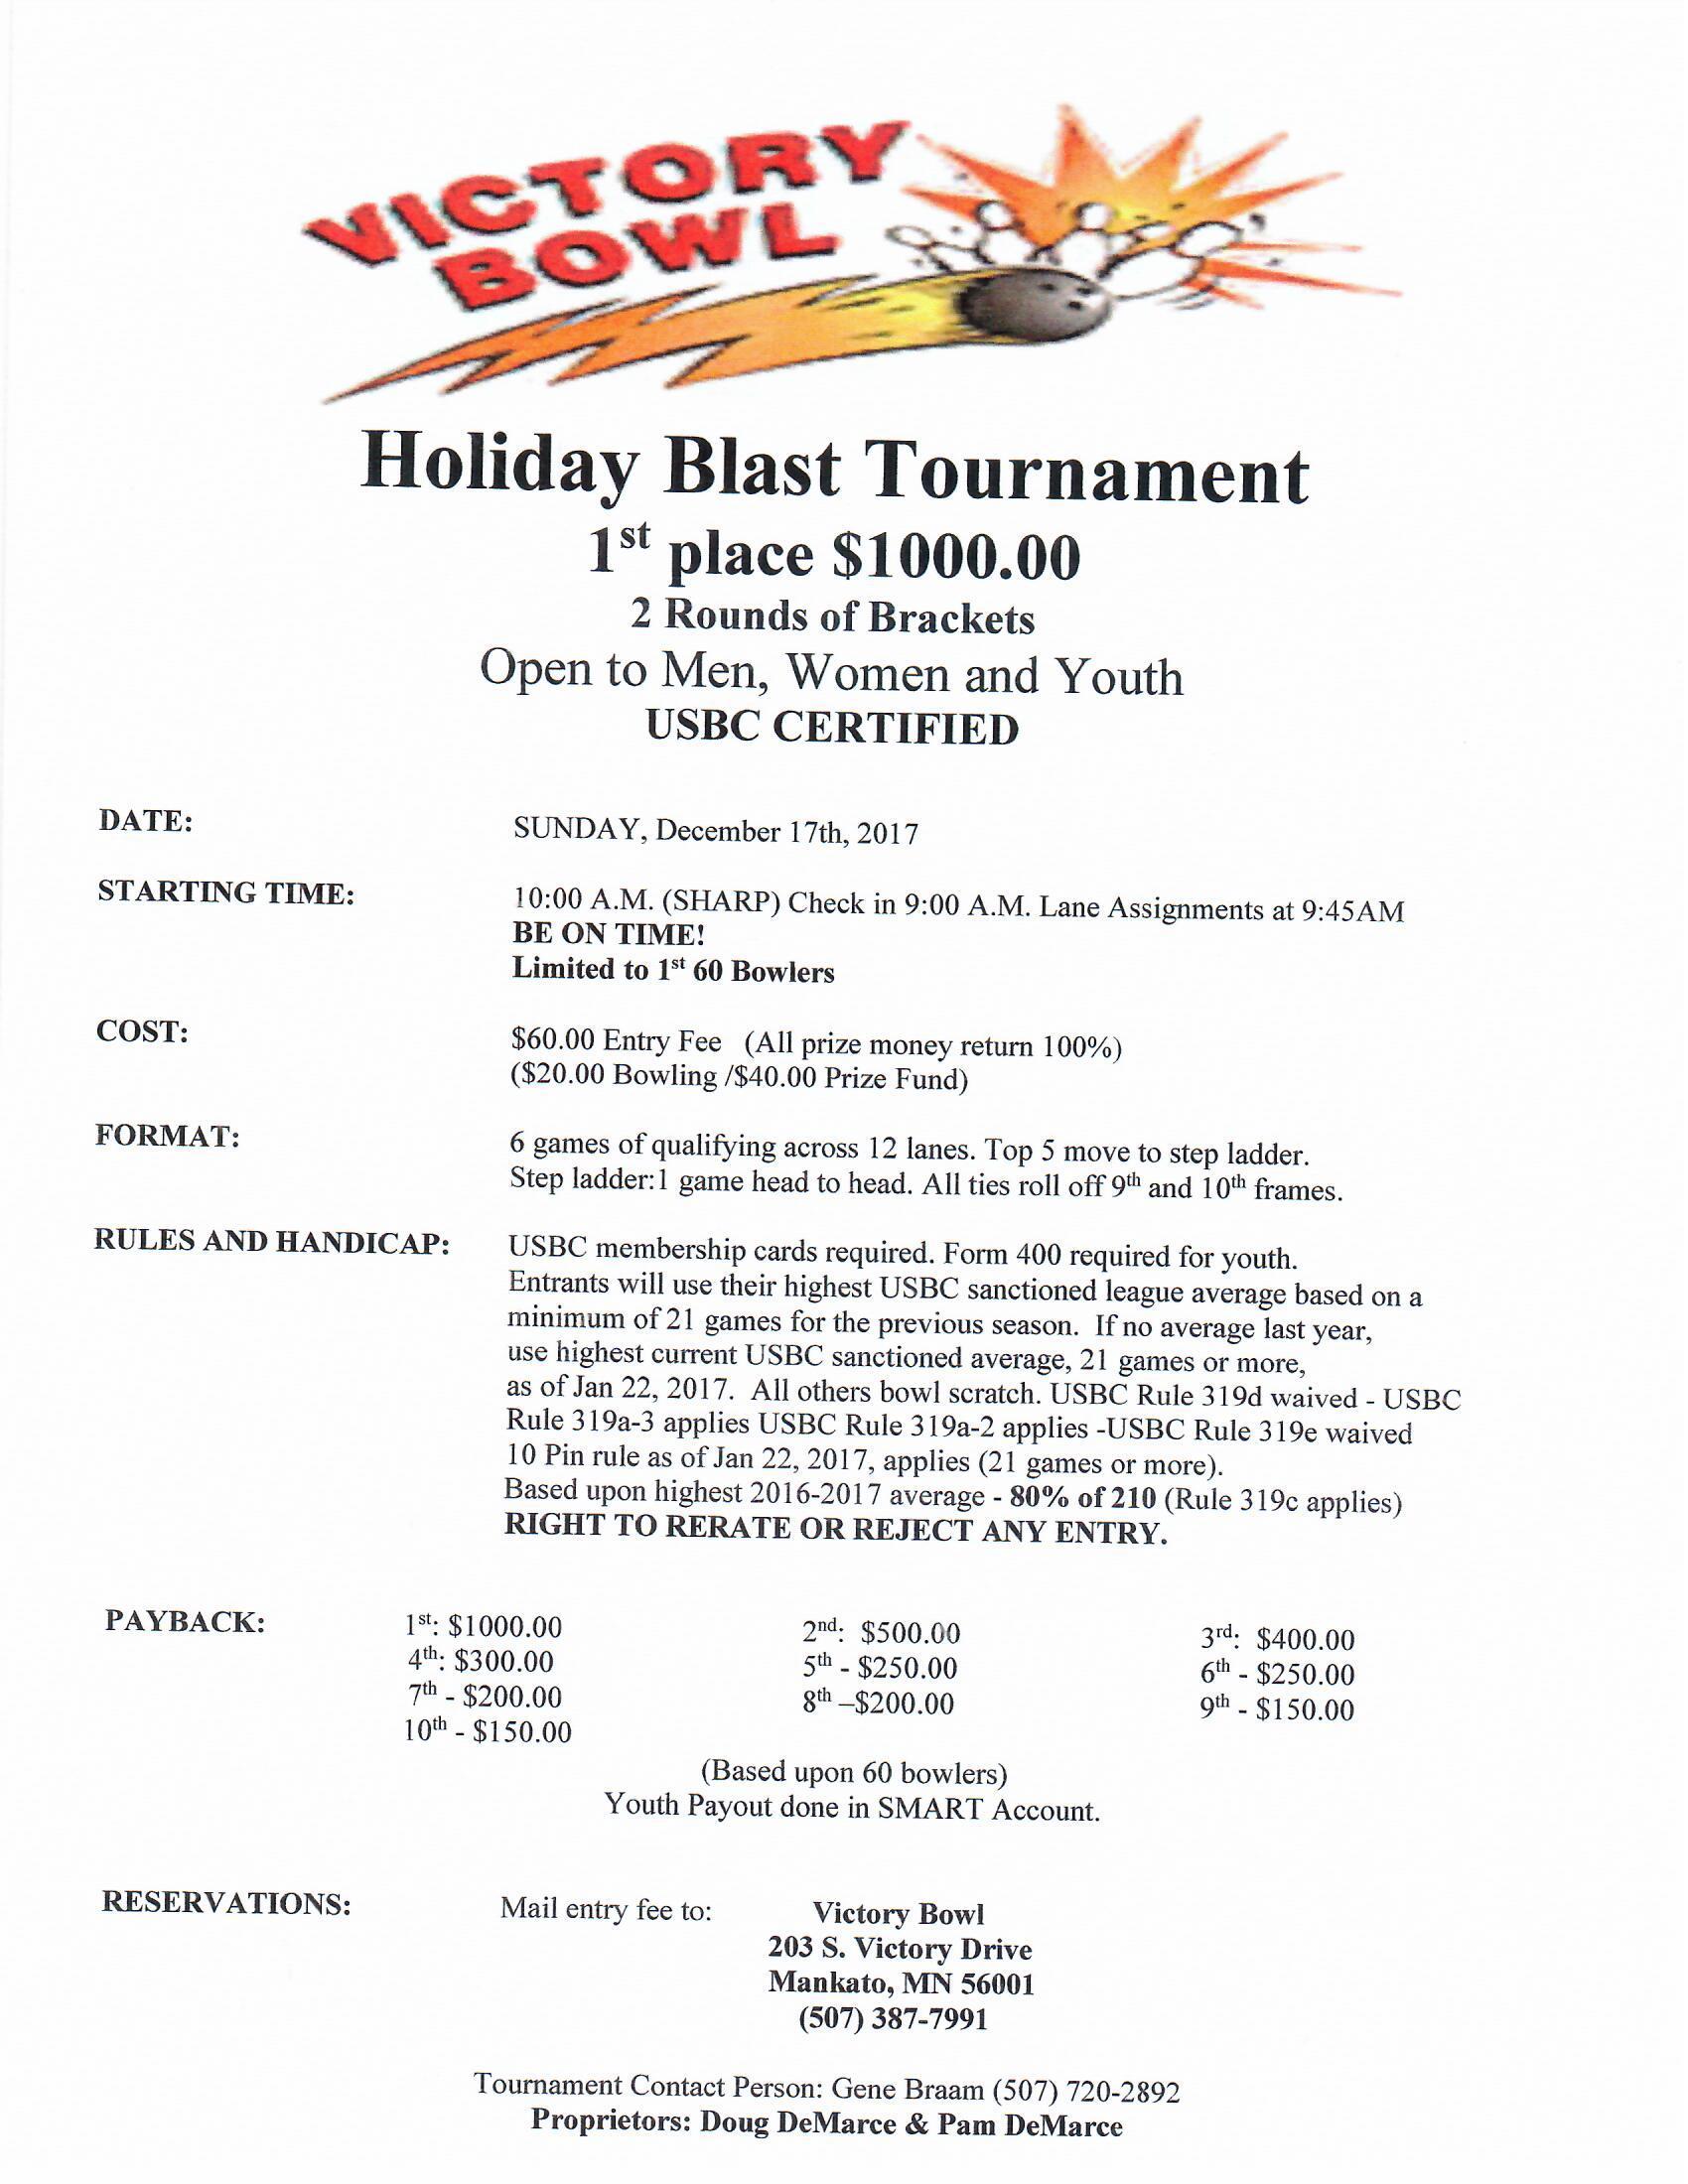 Holiday Blast Tournament December 2017.jpg